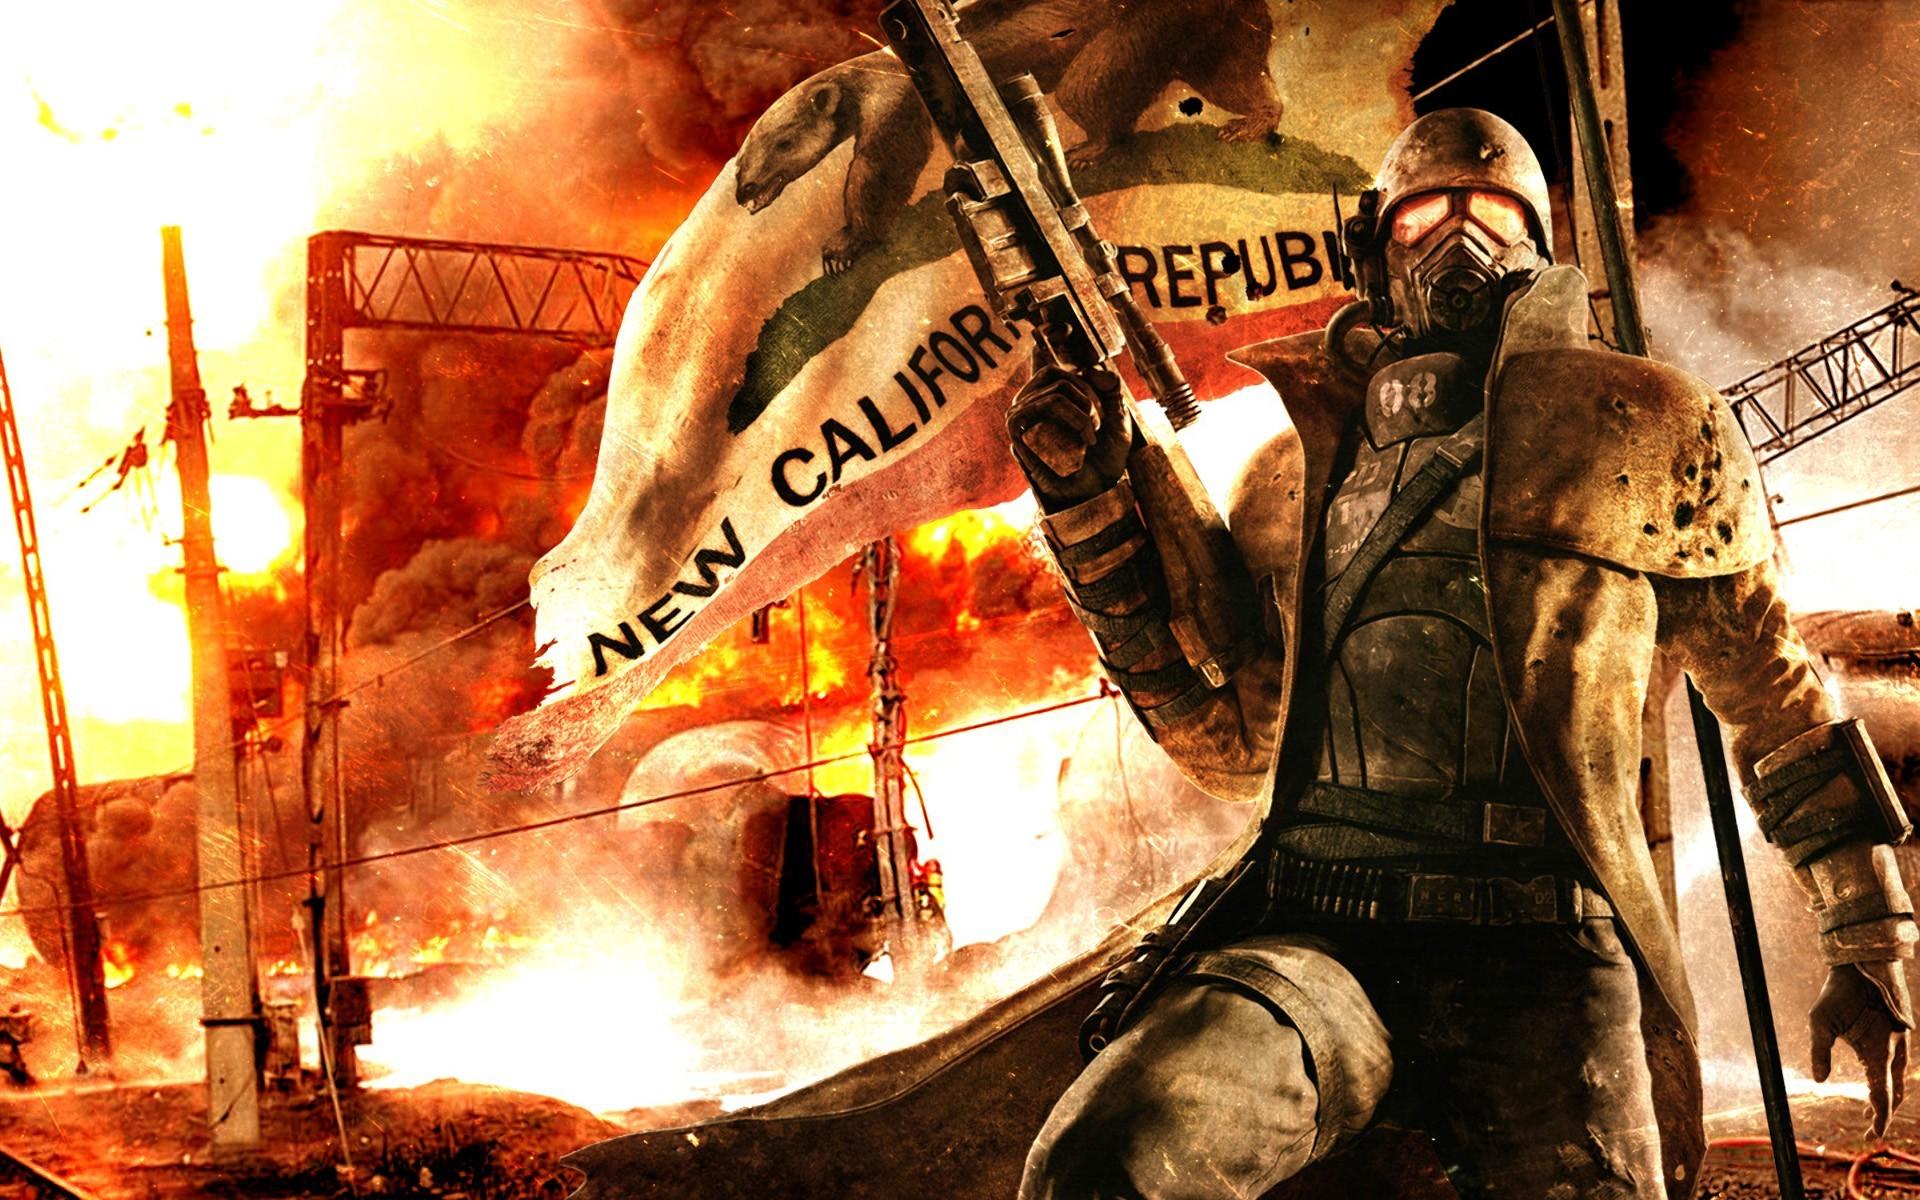 New California Republic Wallpaper (77+ images)